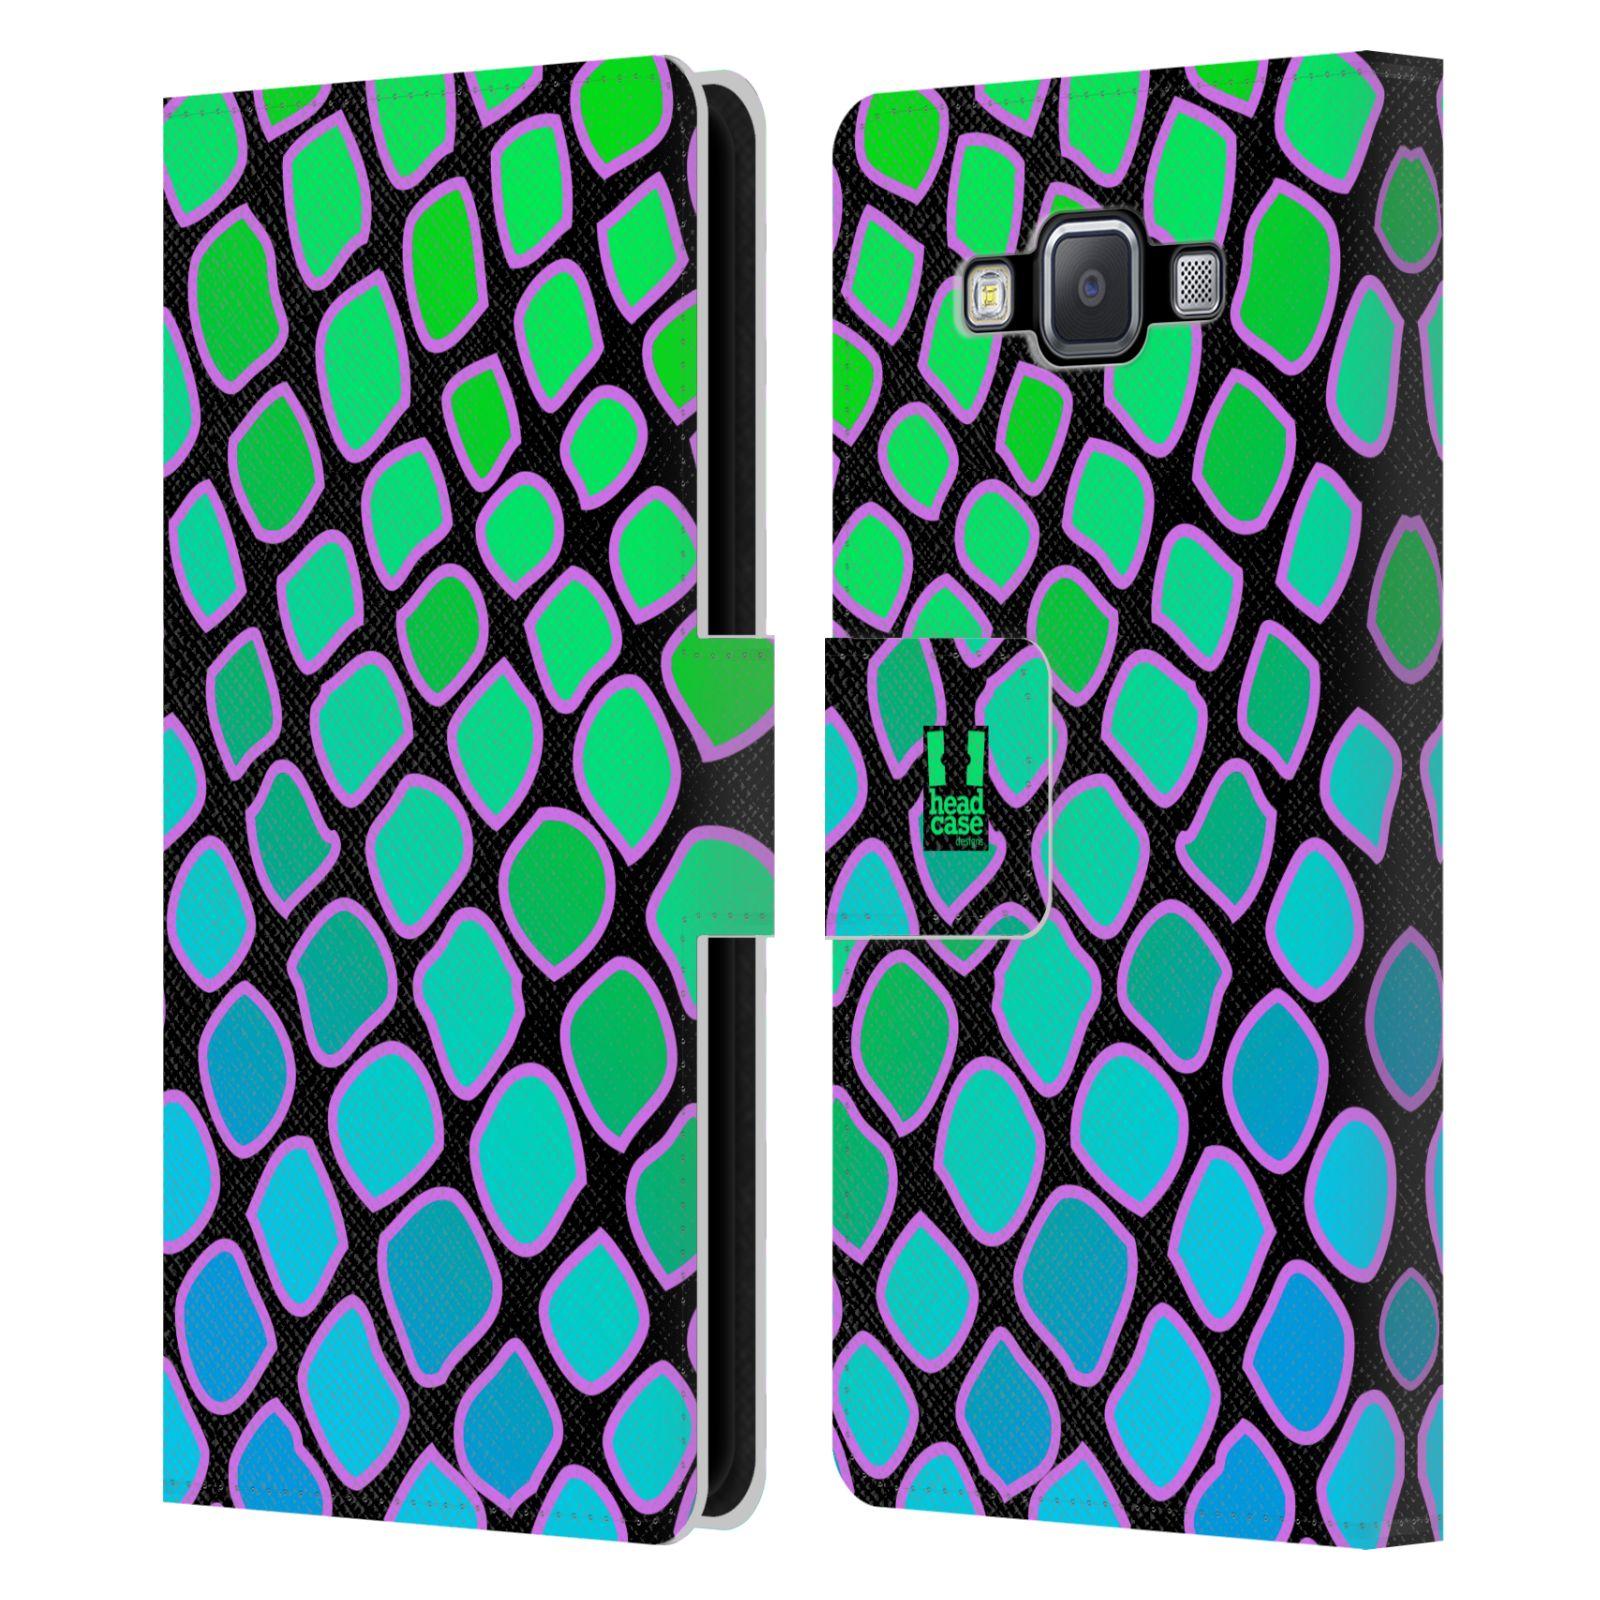 HEAD CASE Flipové pouzdro pro mobil Samsung Galaxy A5 Zvířecí barevné vzory vodní had modrá a zelená barva AQUA